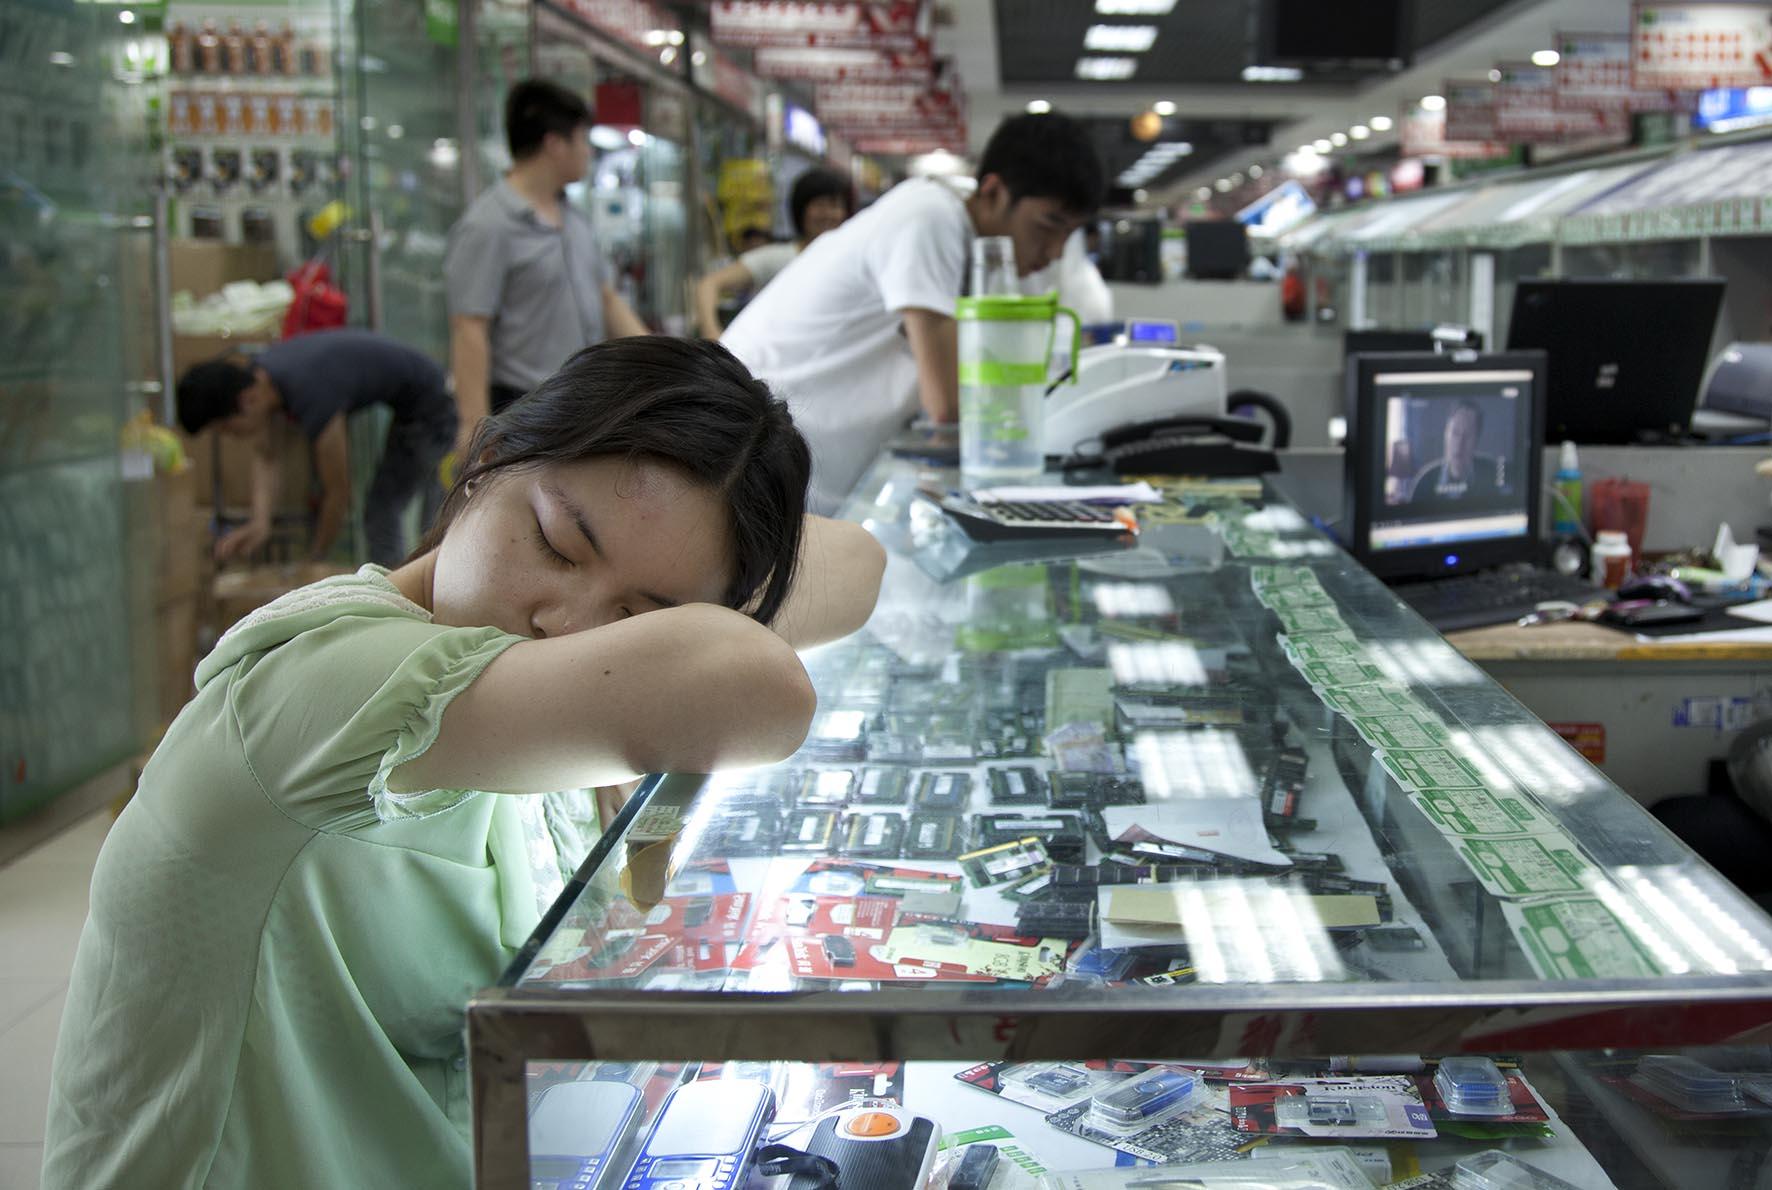 Computer seller asleep inside e-plaza digital square shopping mall Zhongguancun.